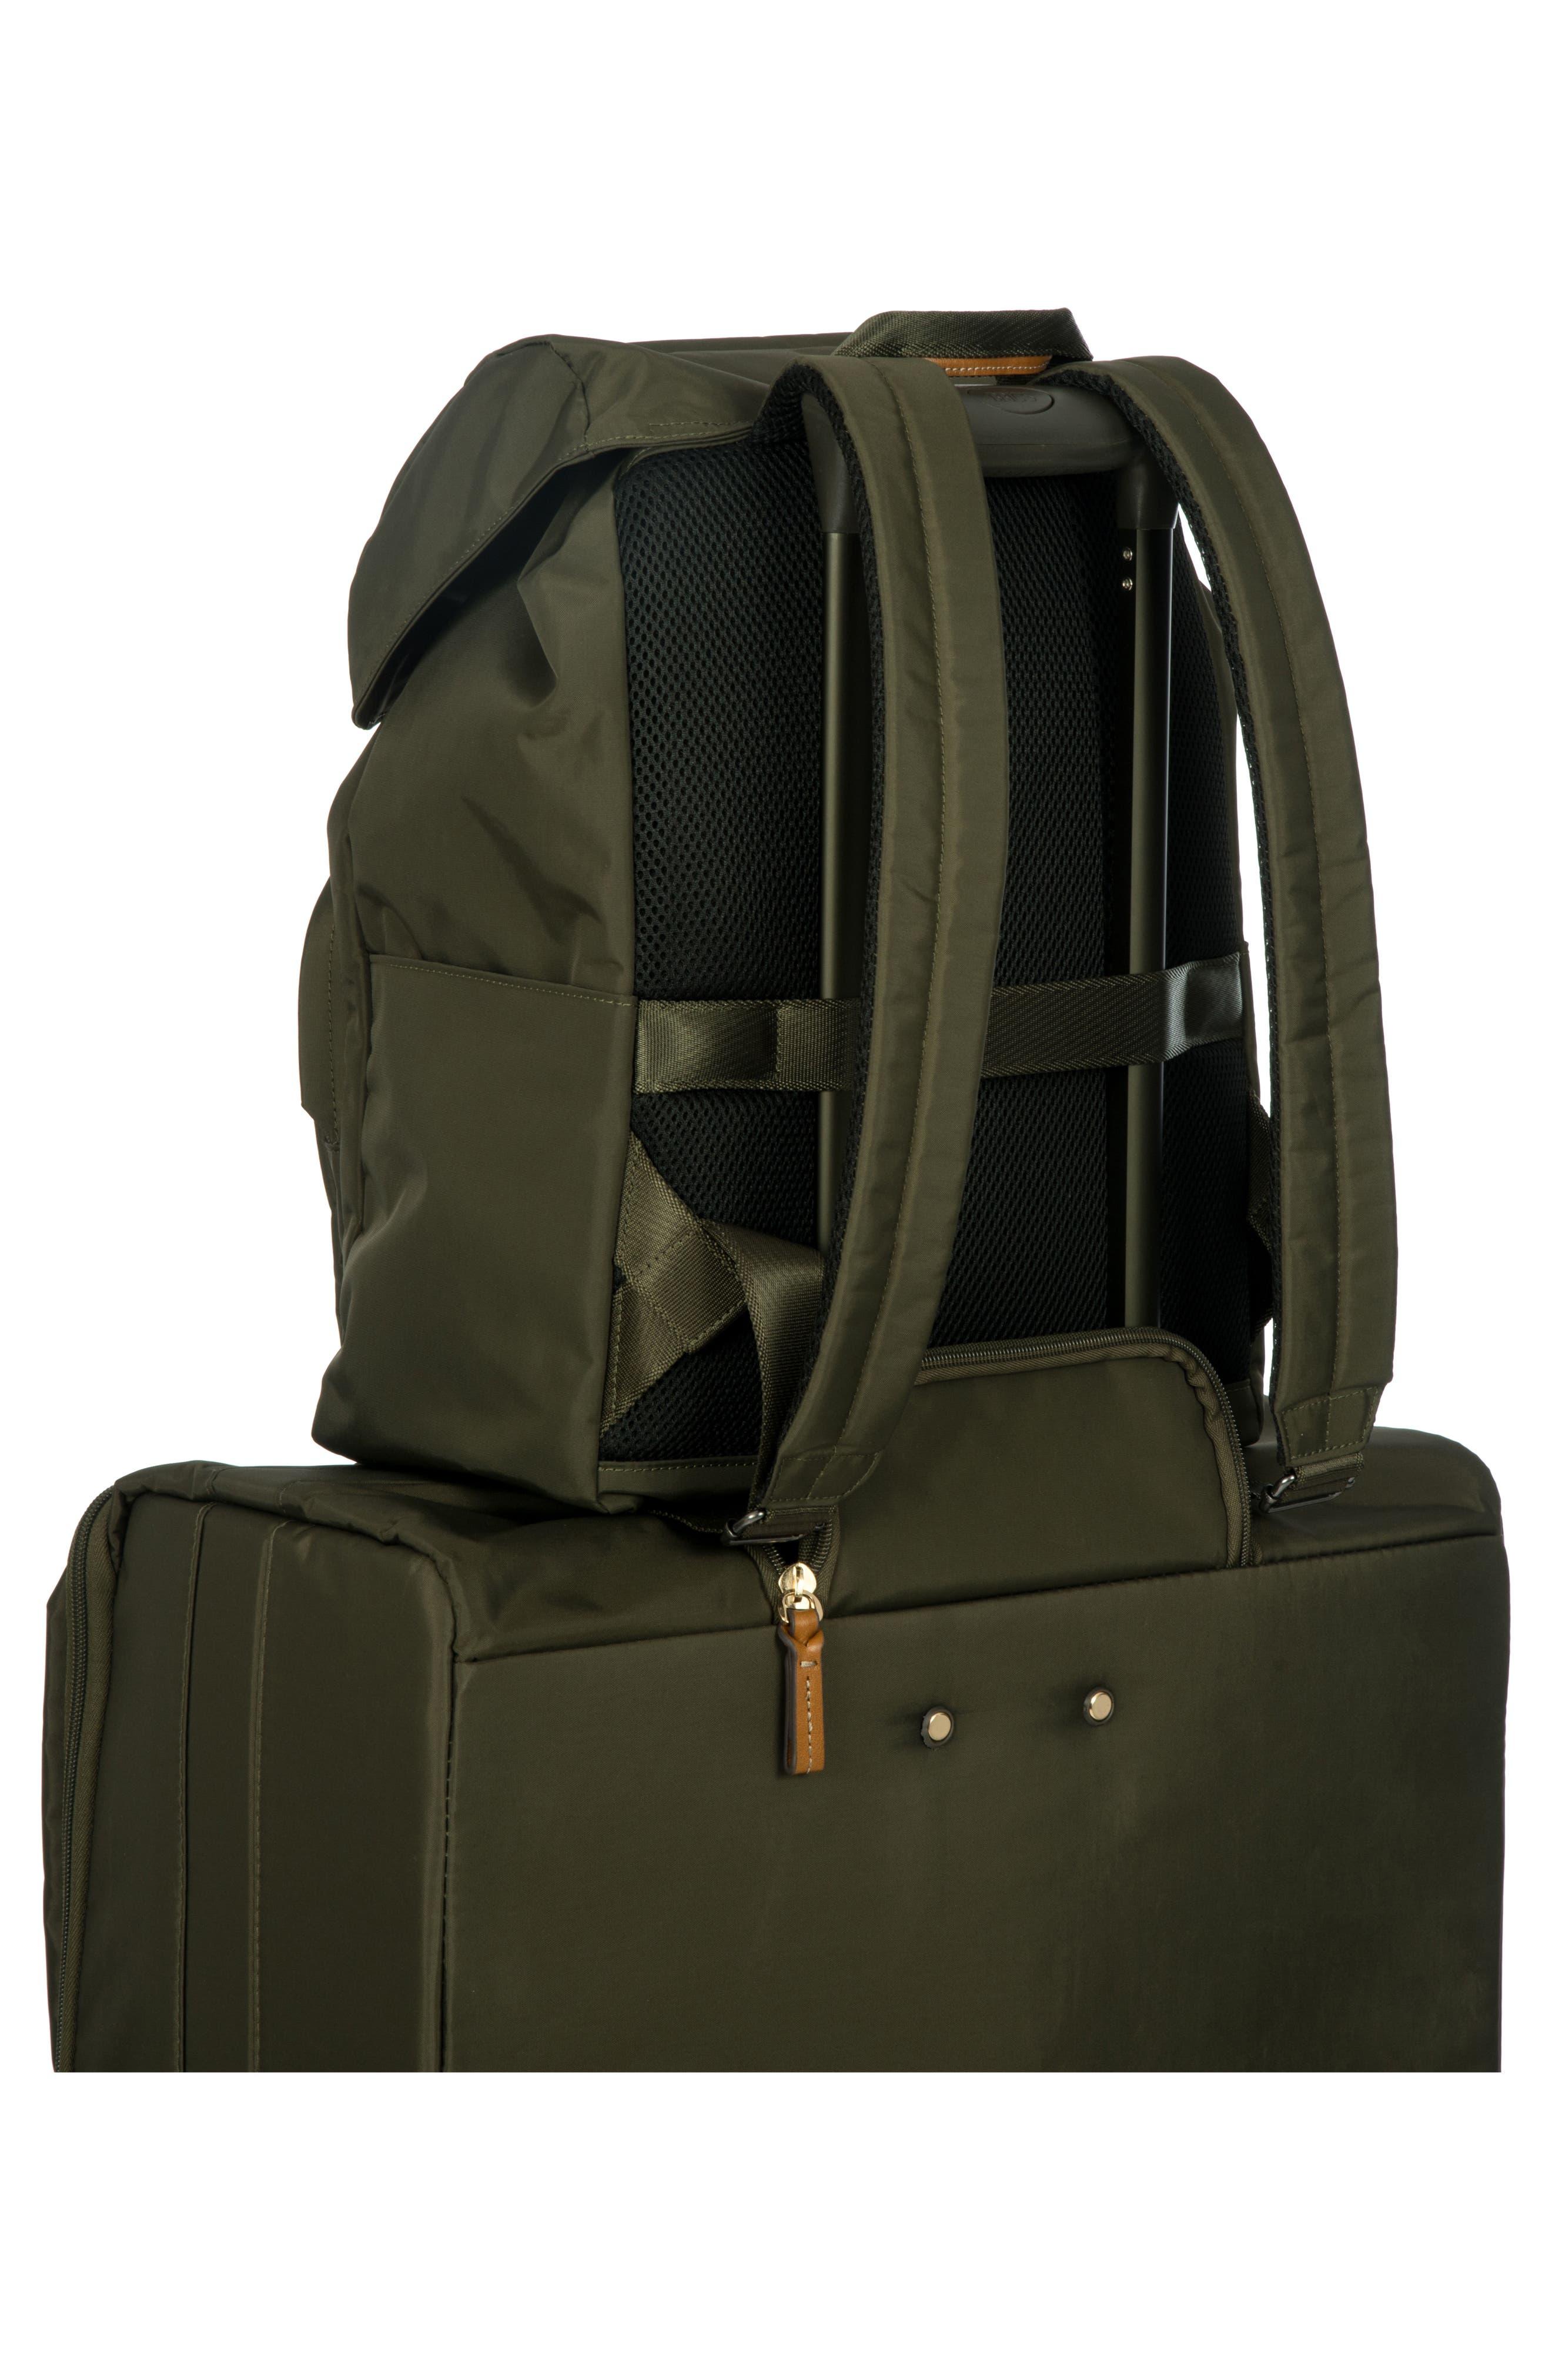 X-Bag Travel Excursion Backpack,                             Alternate thumbnail 2, color,                             Olive